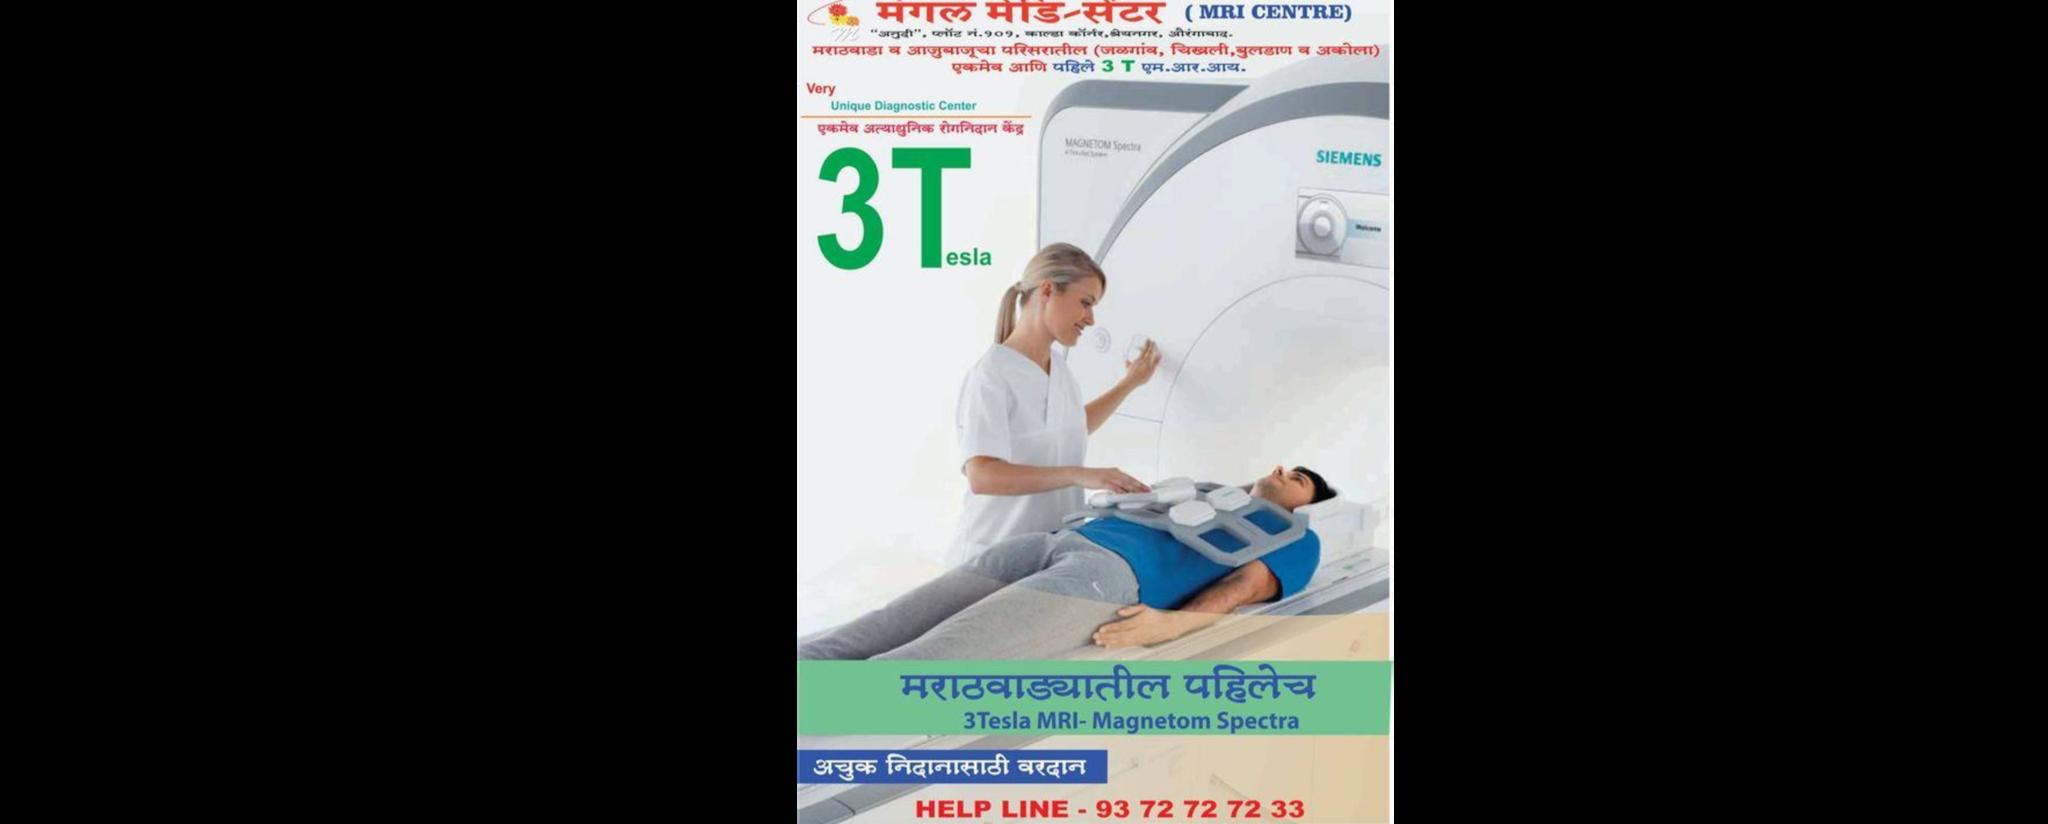 3t Mri Mangal Medi Center - Diagnostic Centre and Clinical Laboratory in Shreya Nagar, Aurangabad-Maharashtra